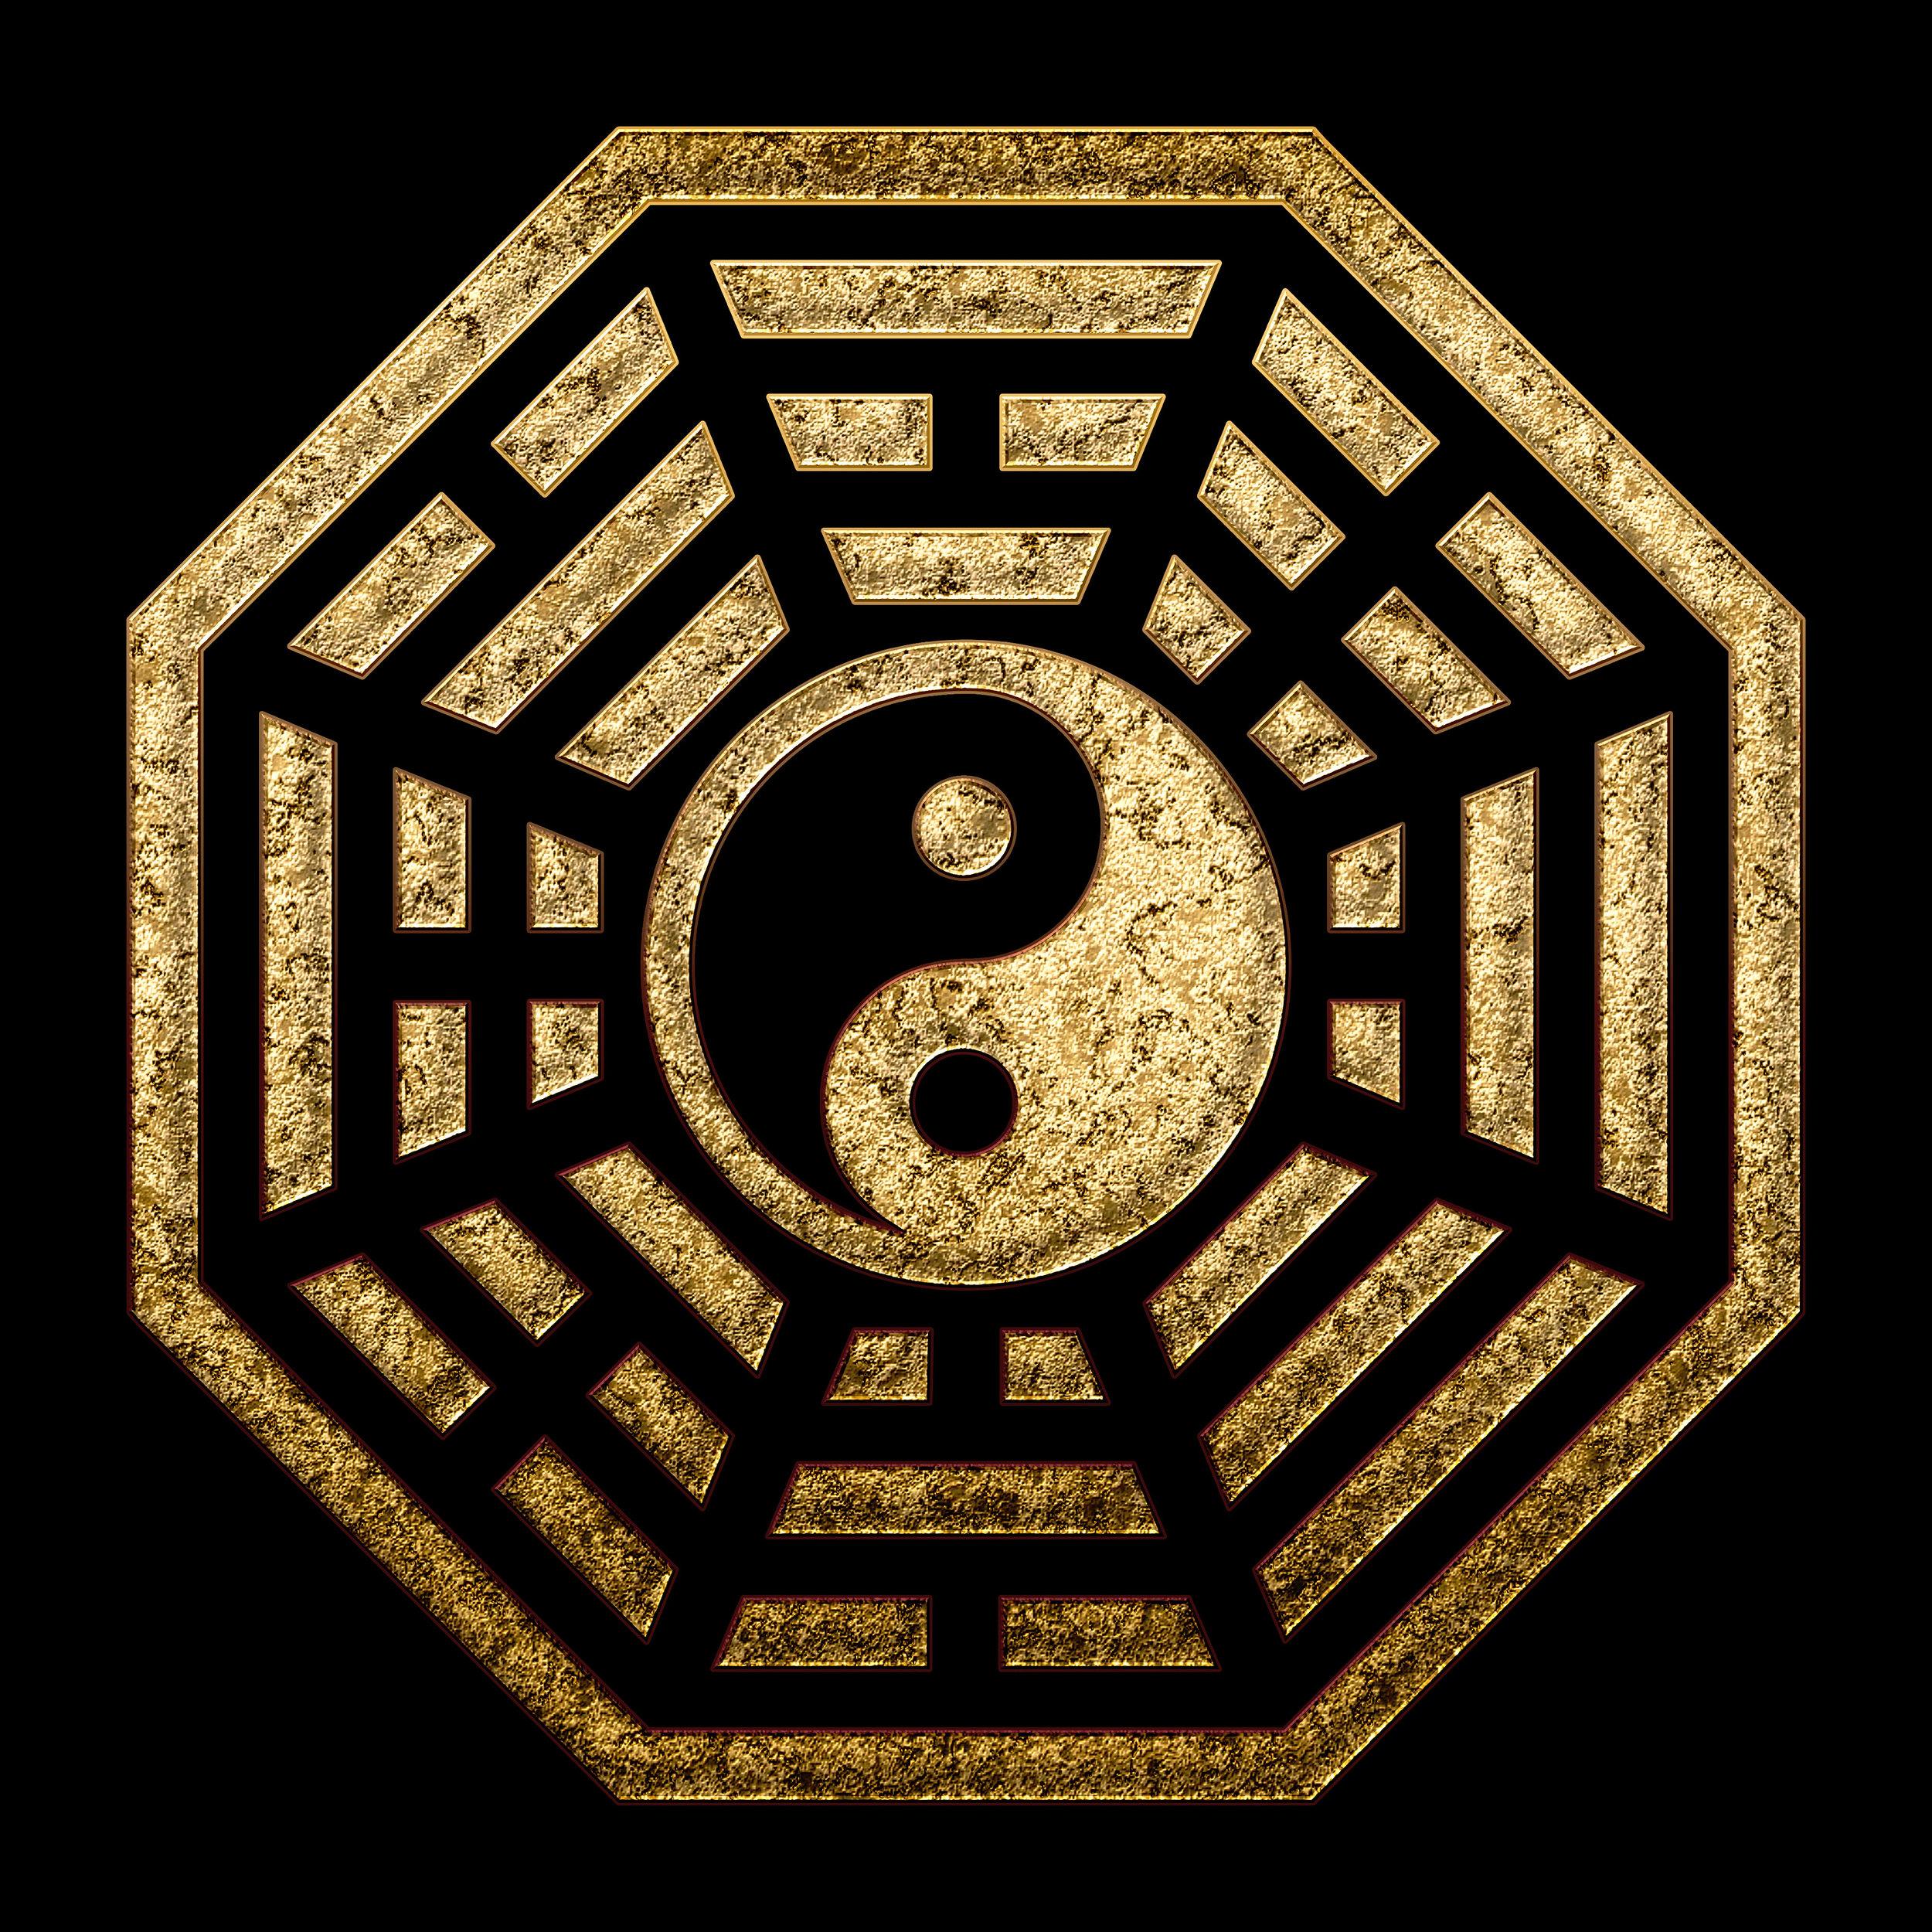 Bagua symbol - The eight trigrams surrounding the taiji symbol (of yin and yang)